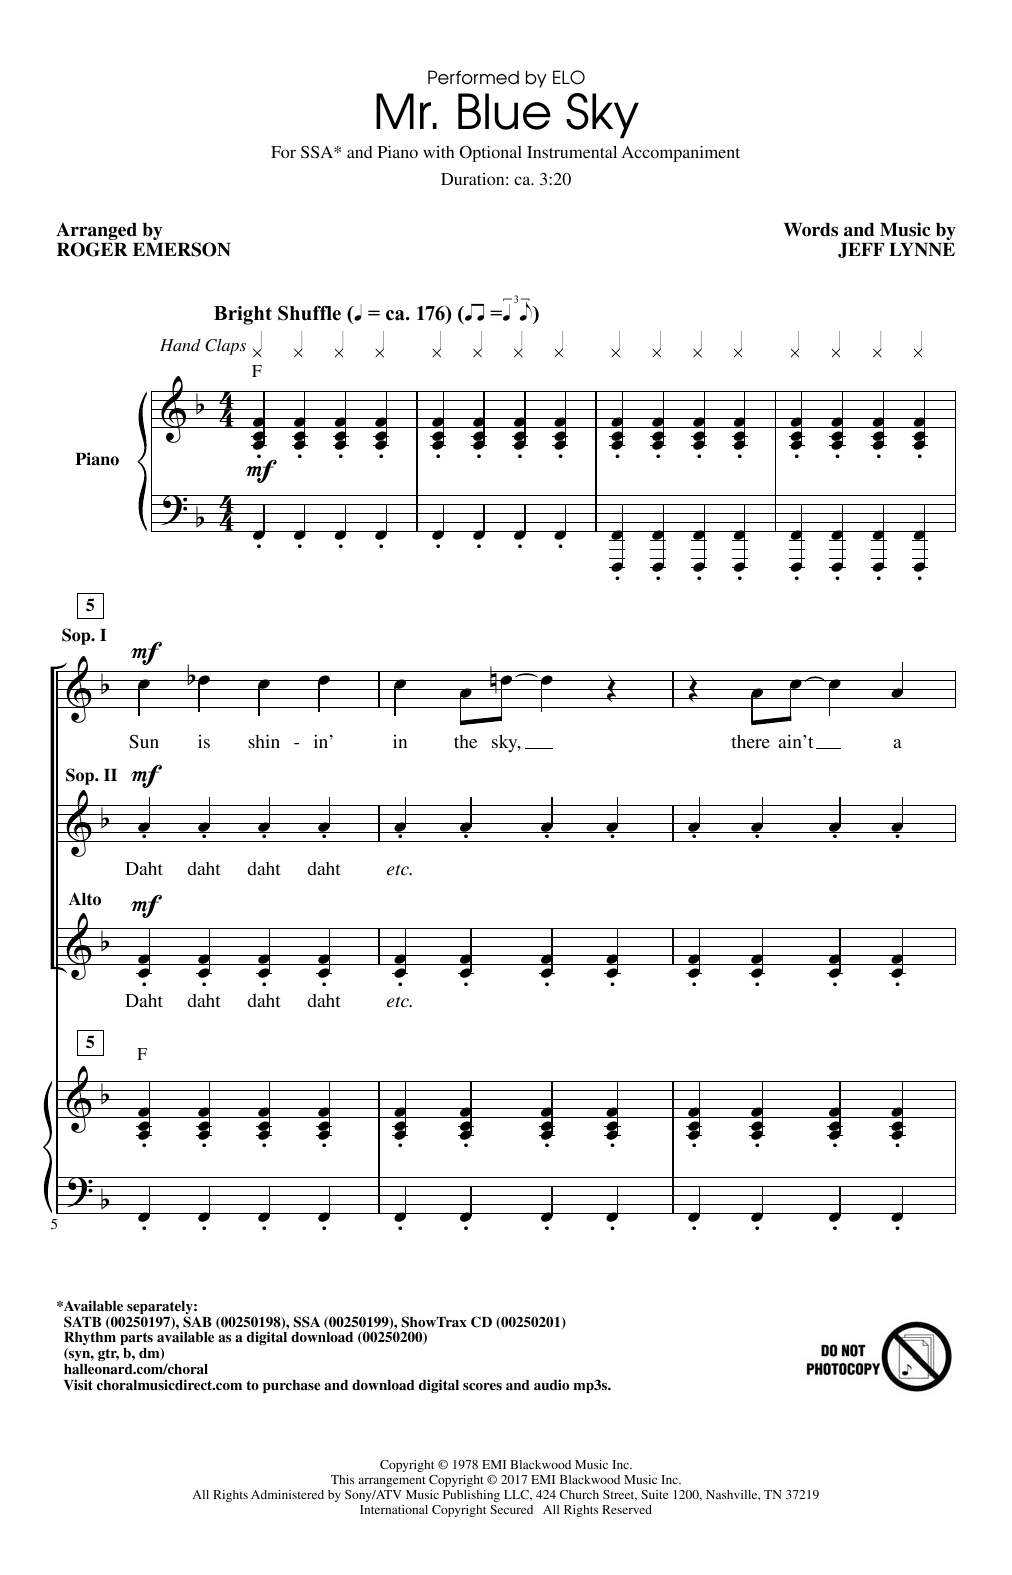 Mr. Blue Sky (arr. Roger Emerson) Sheet Music